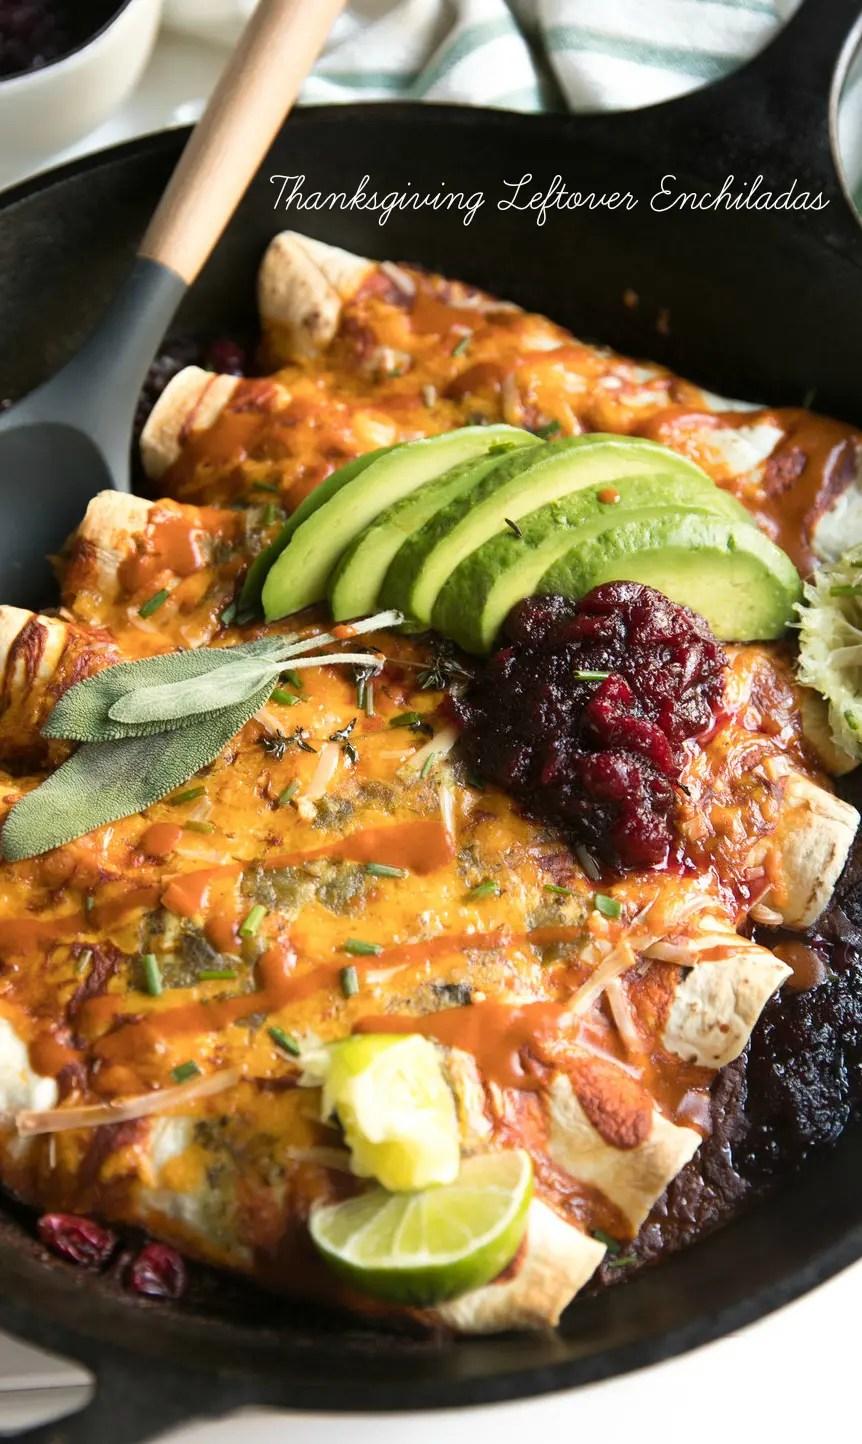 Thanksgiving Leftover Enchiladas via @theforkedspoon #leftovers #enchiladas #turkey #holidayleftovers #easyrecipe #cheese